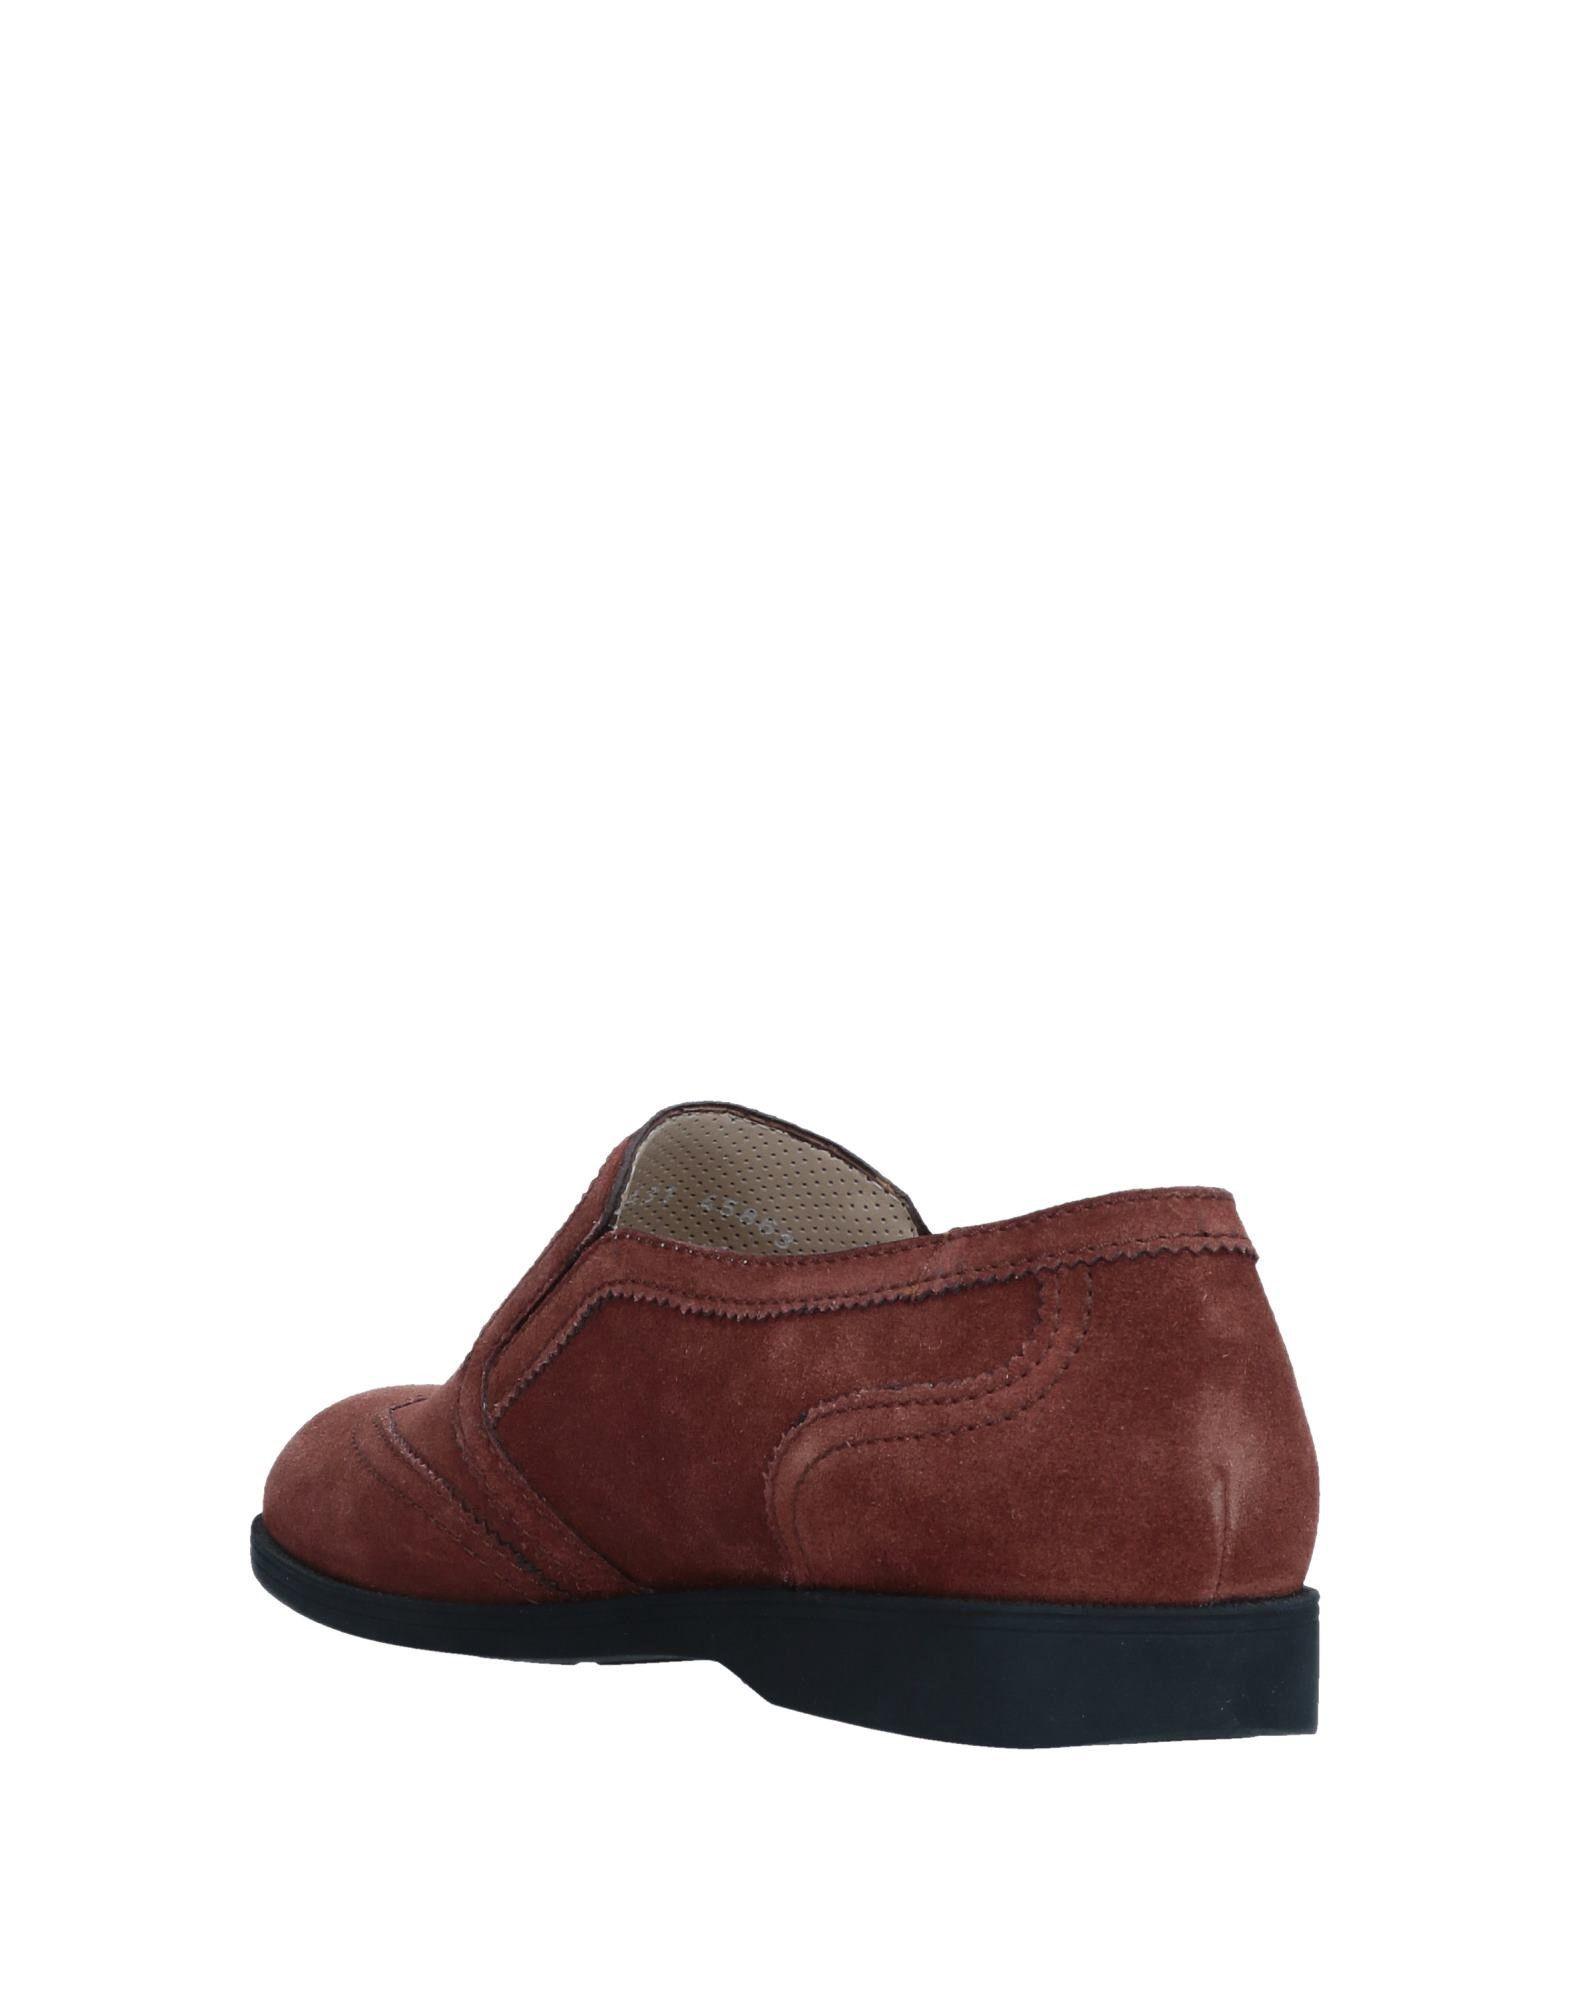 A.Testoni 11548593NQ Mokassins Herren  11548593NQ A.Testoni Gute Qualität beliebte Schuhe 6fdef8